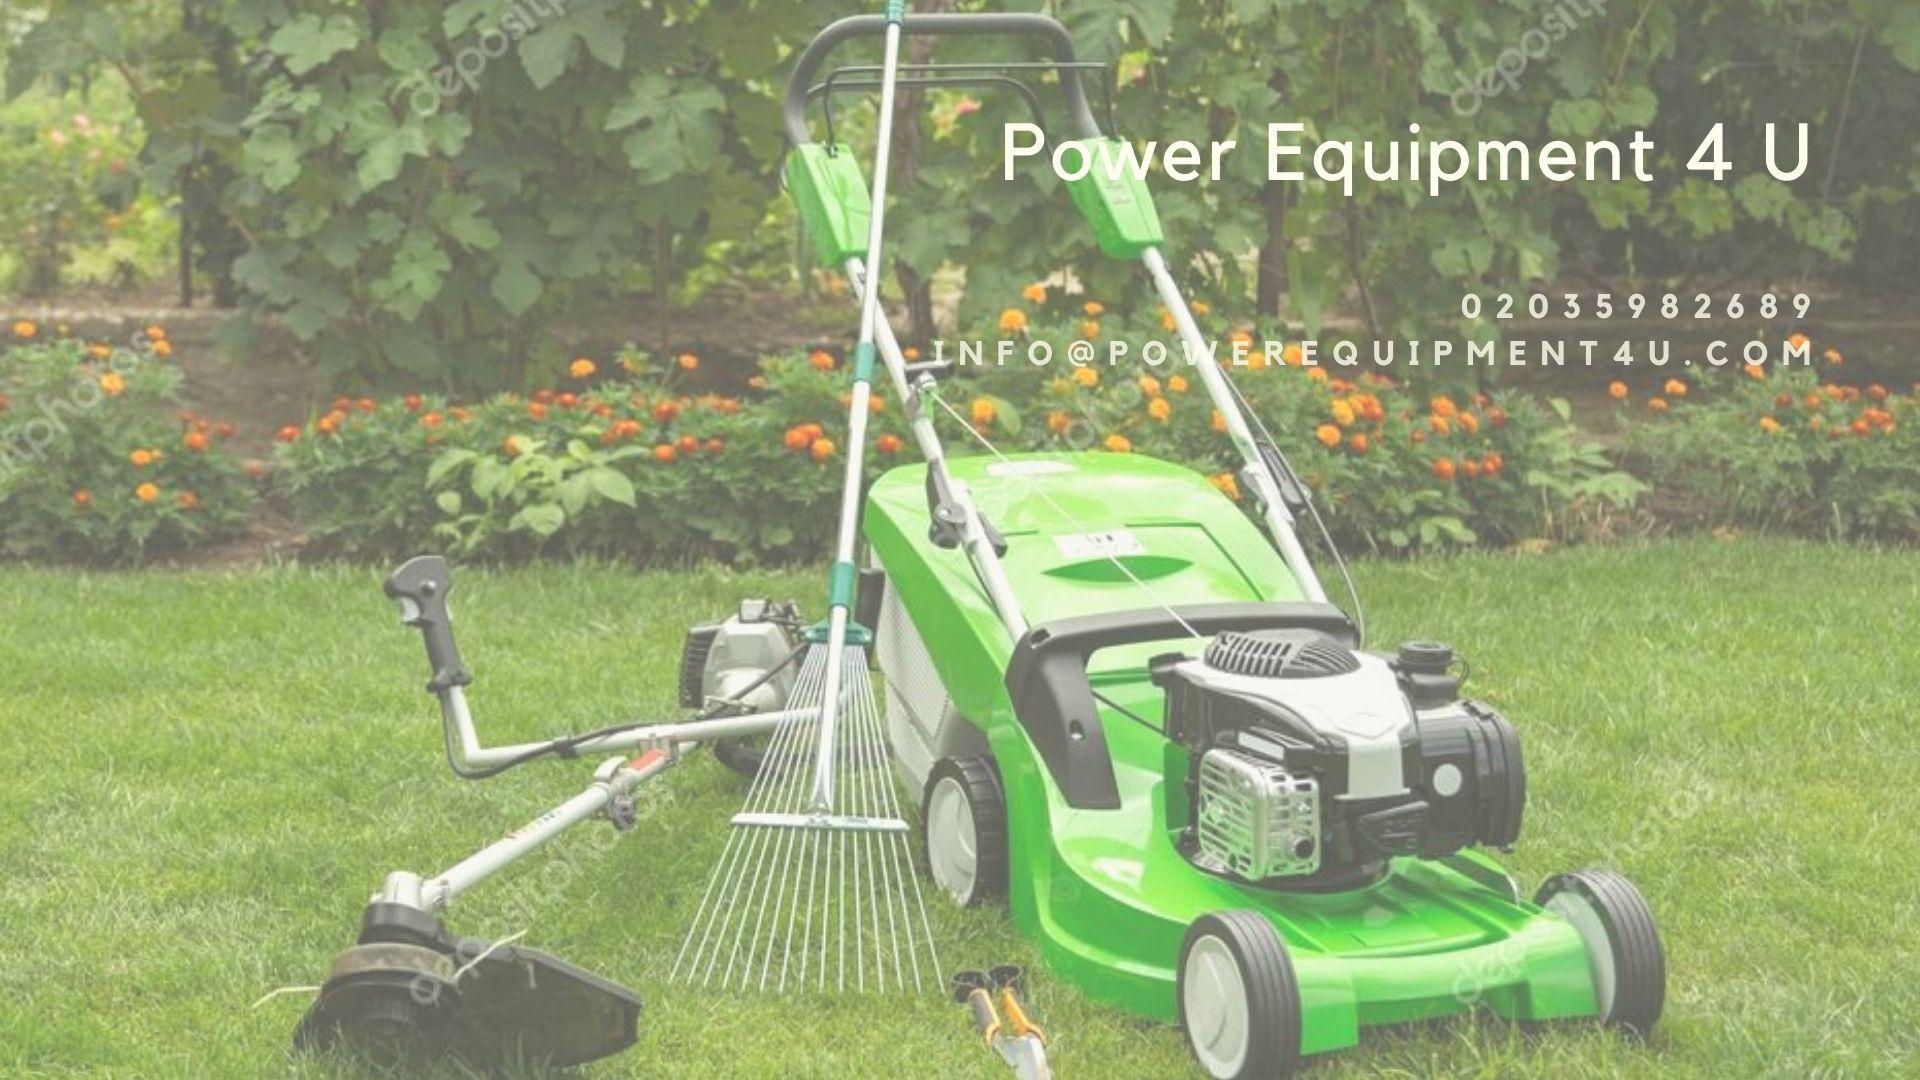 Hyundai Garden Machinery Suppliers in 2020 Generators